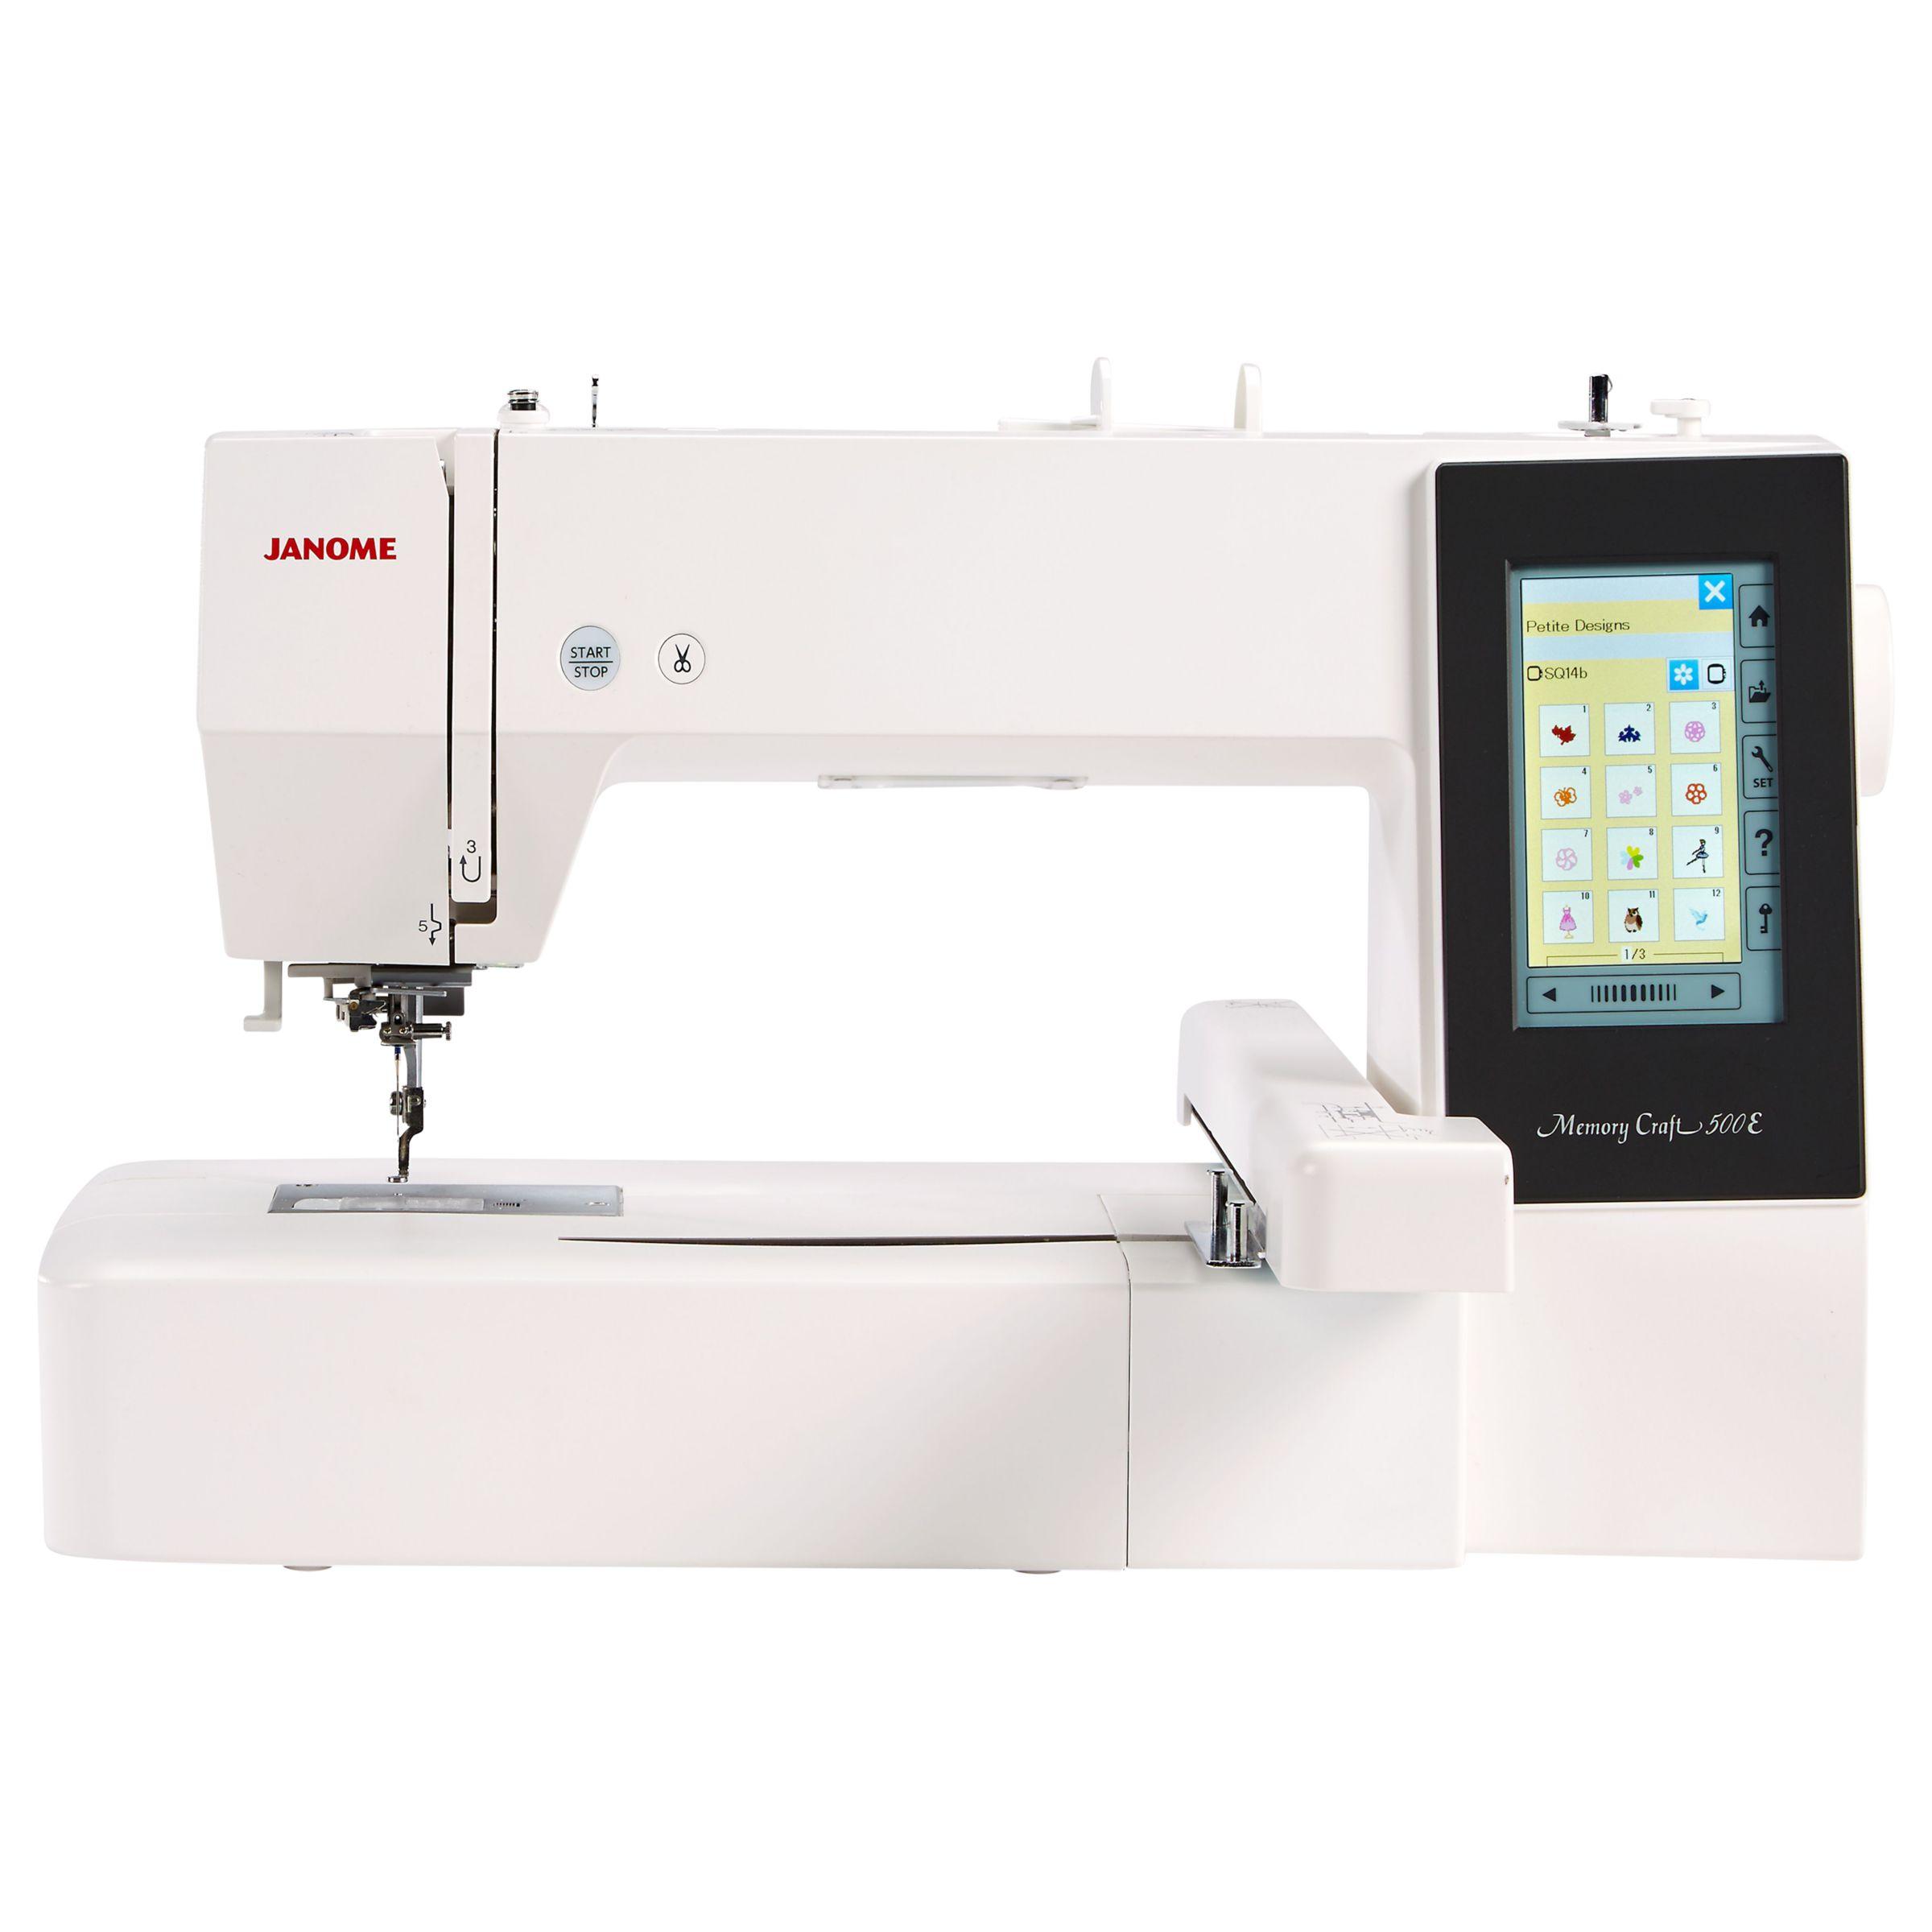 Janome Janome Memory Craft 500E Embroidery Machine